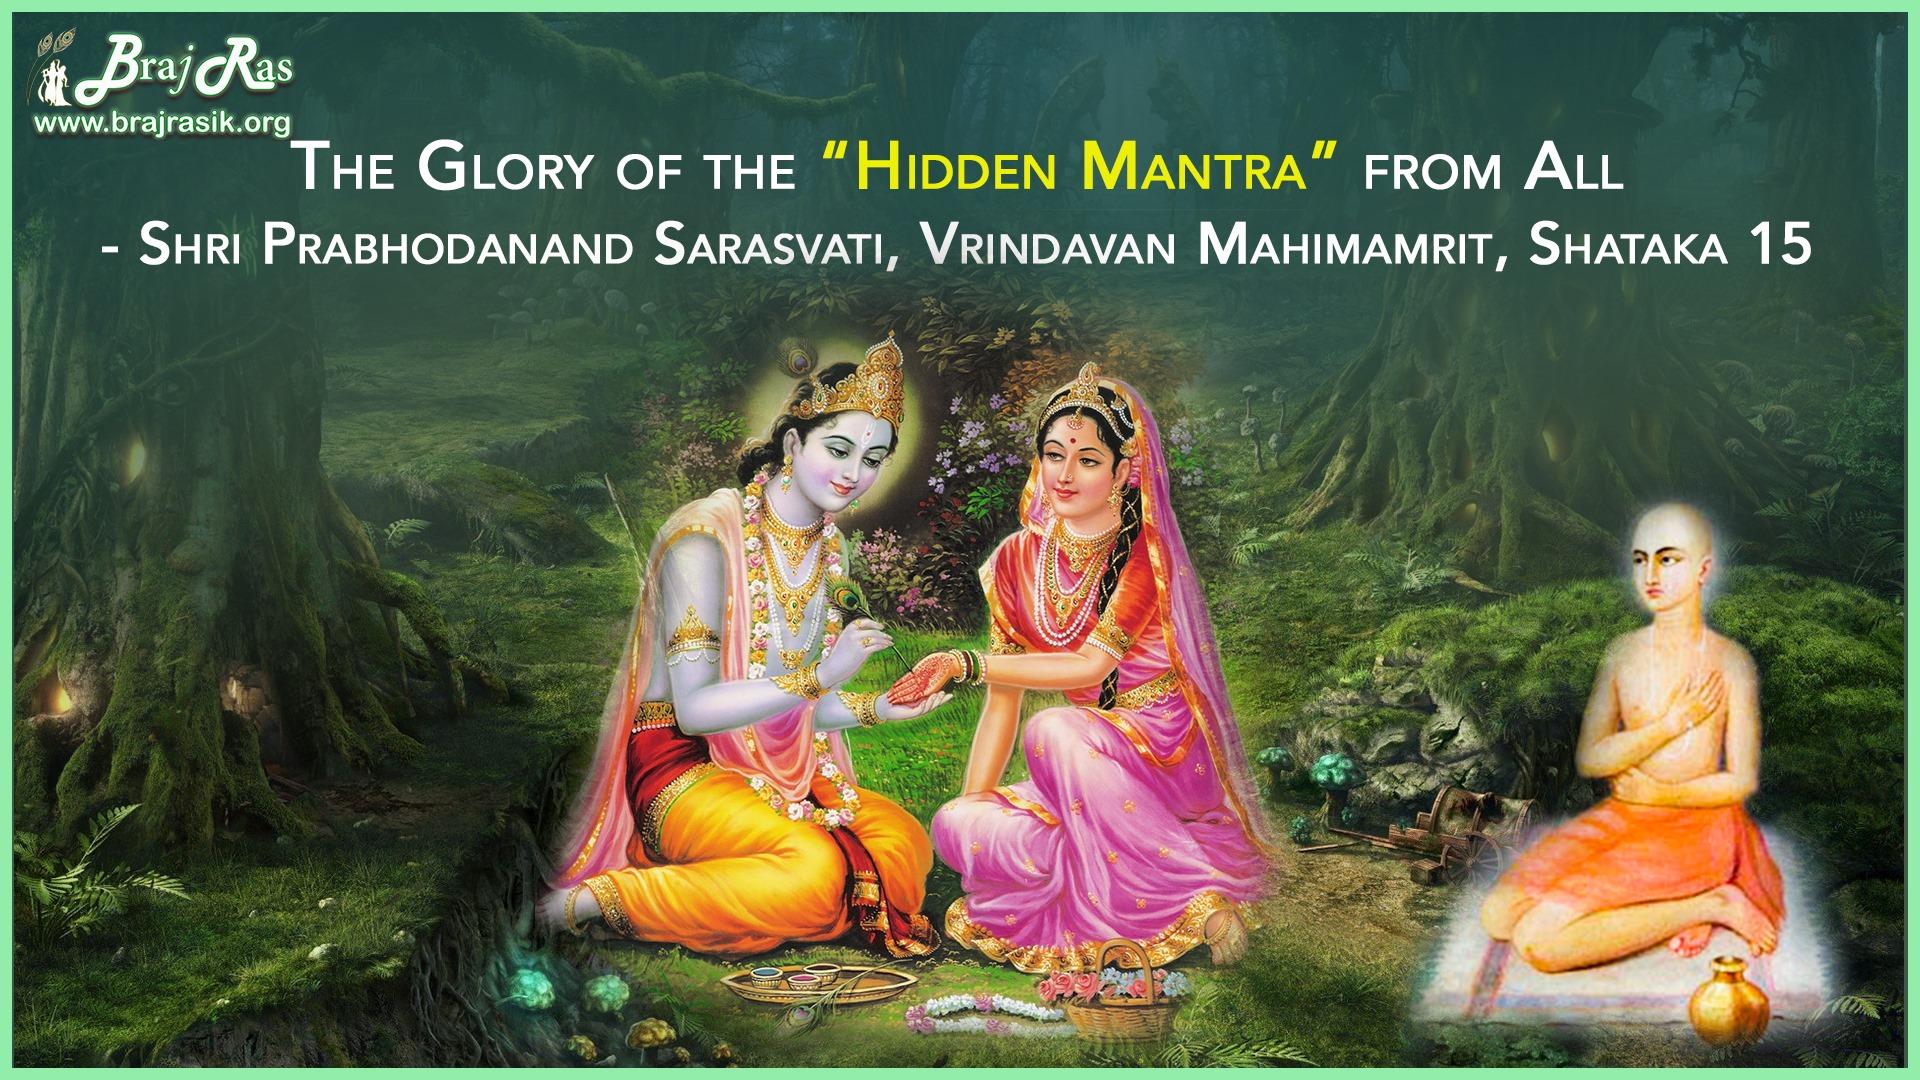 The Glory of the Hidden Mantra from All - Shri Prabhodanand Sarasvati, Vrindavan Mahimamrit, Shataka 15